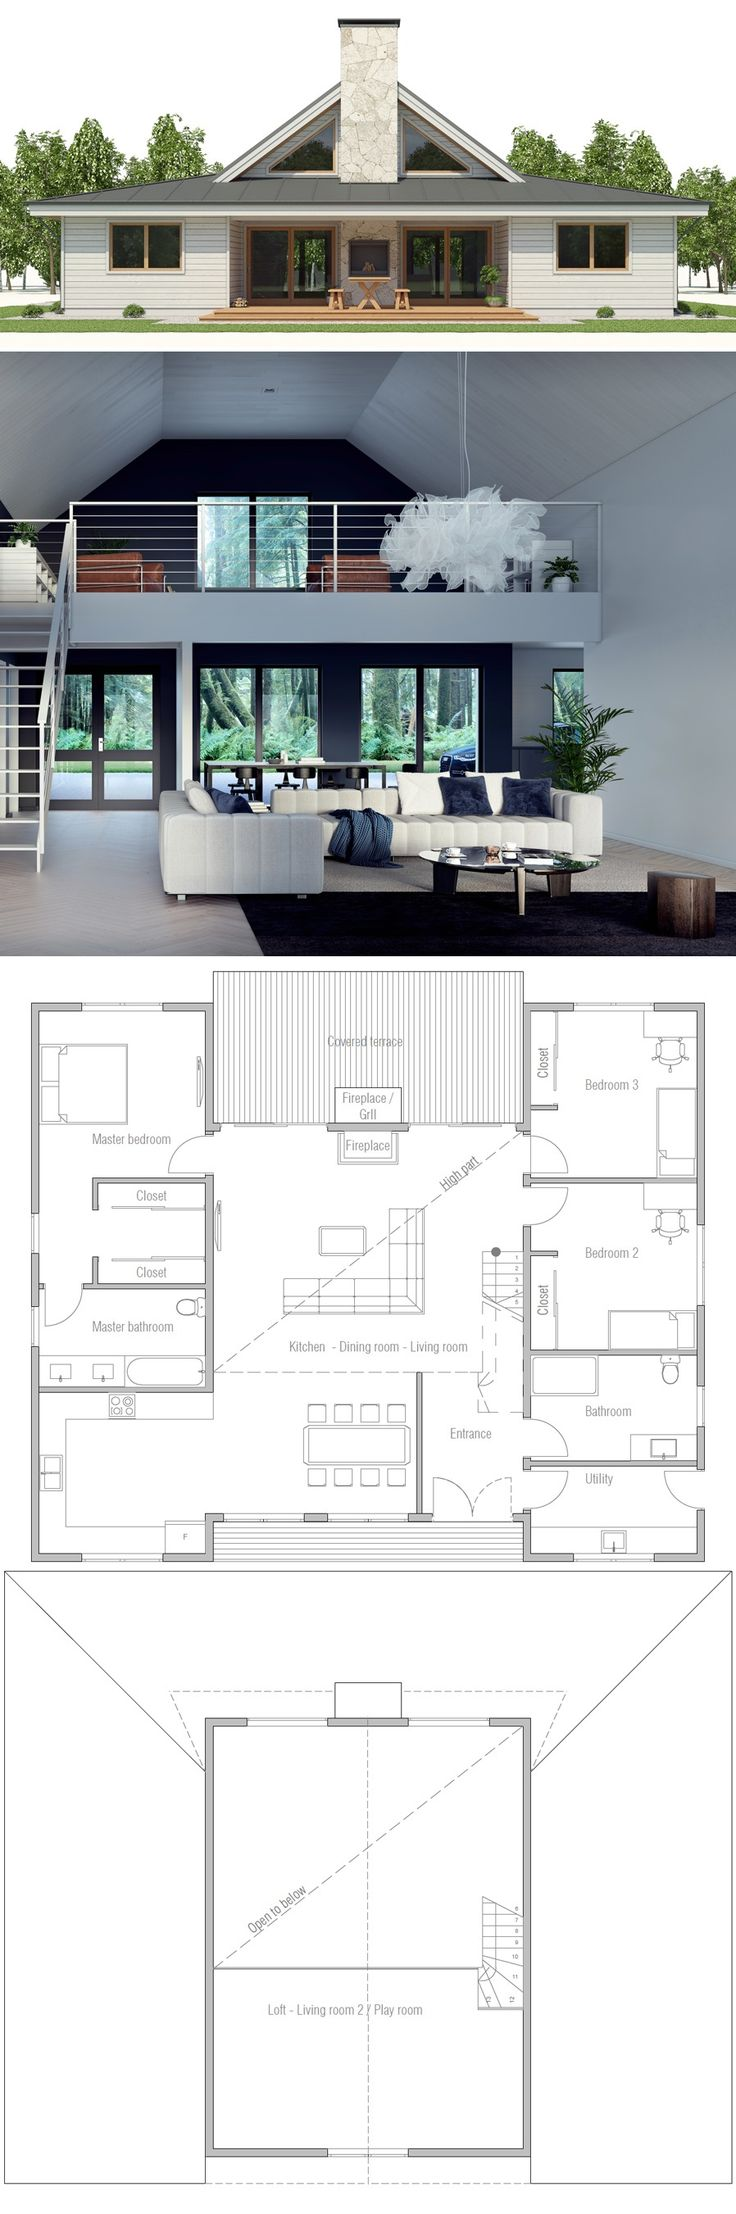 Small House Plan, Shipping container home plan, modular house plan